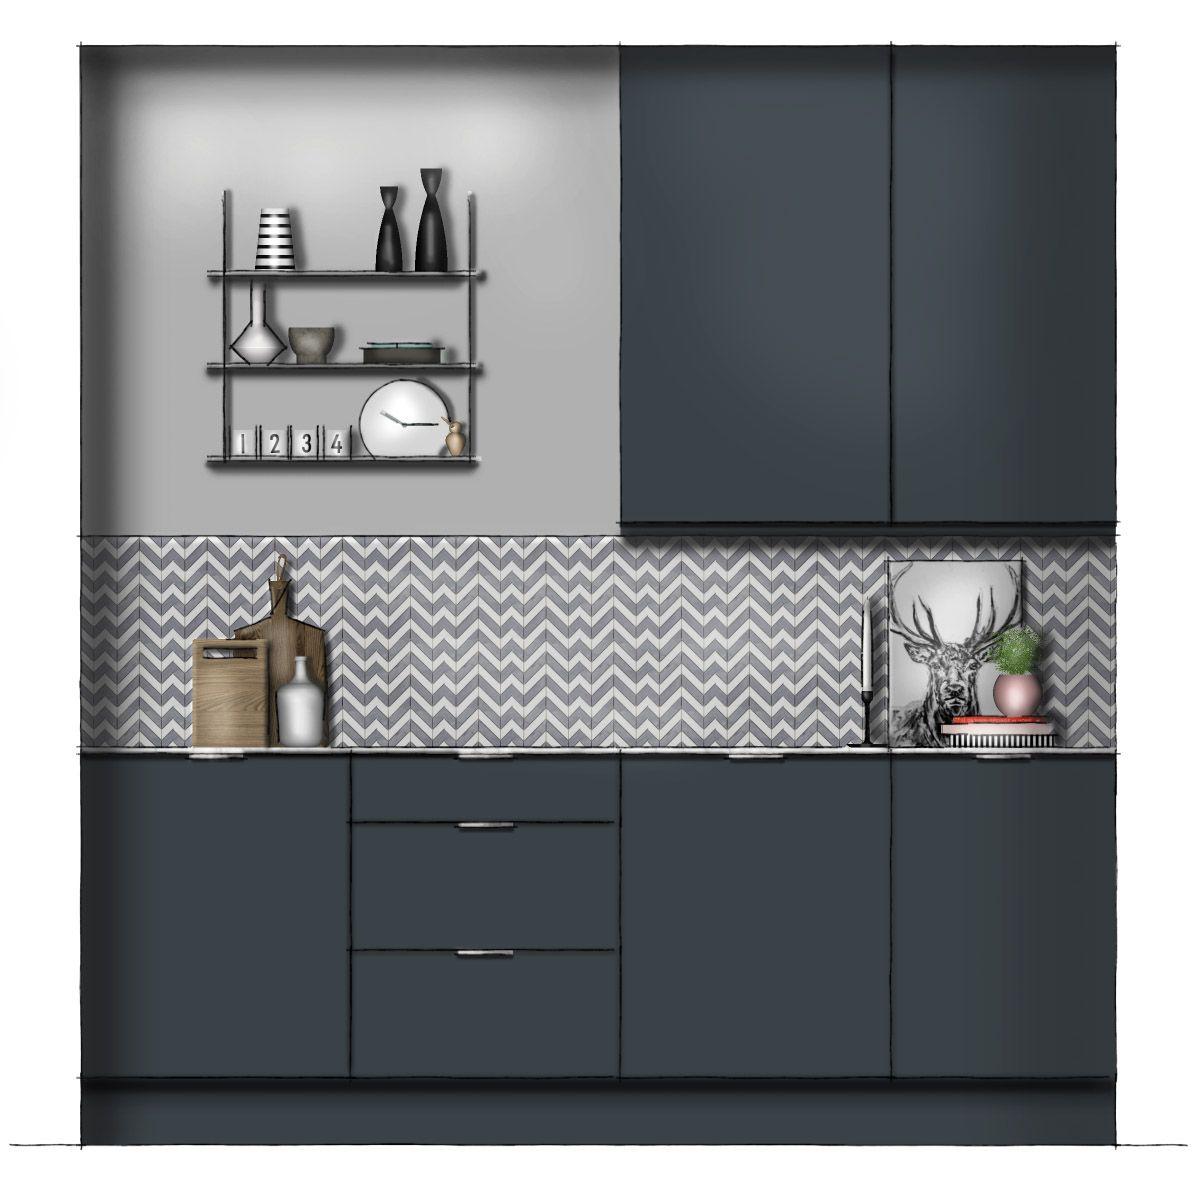 #7 Rendering Floor Plans & Elevations